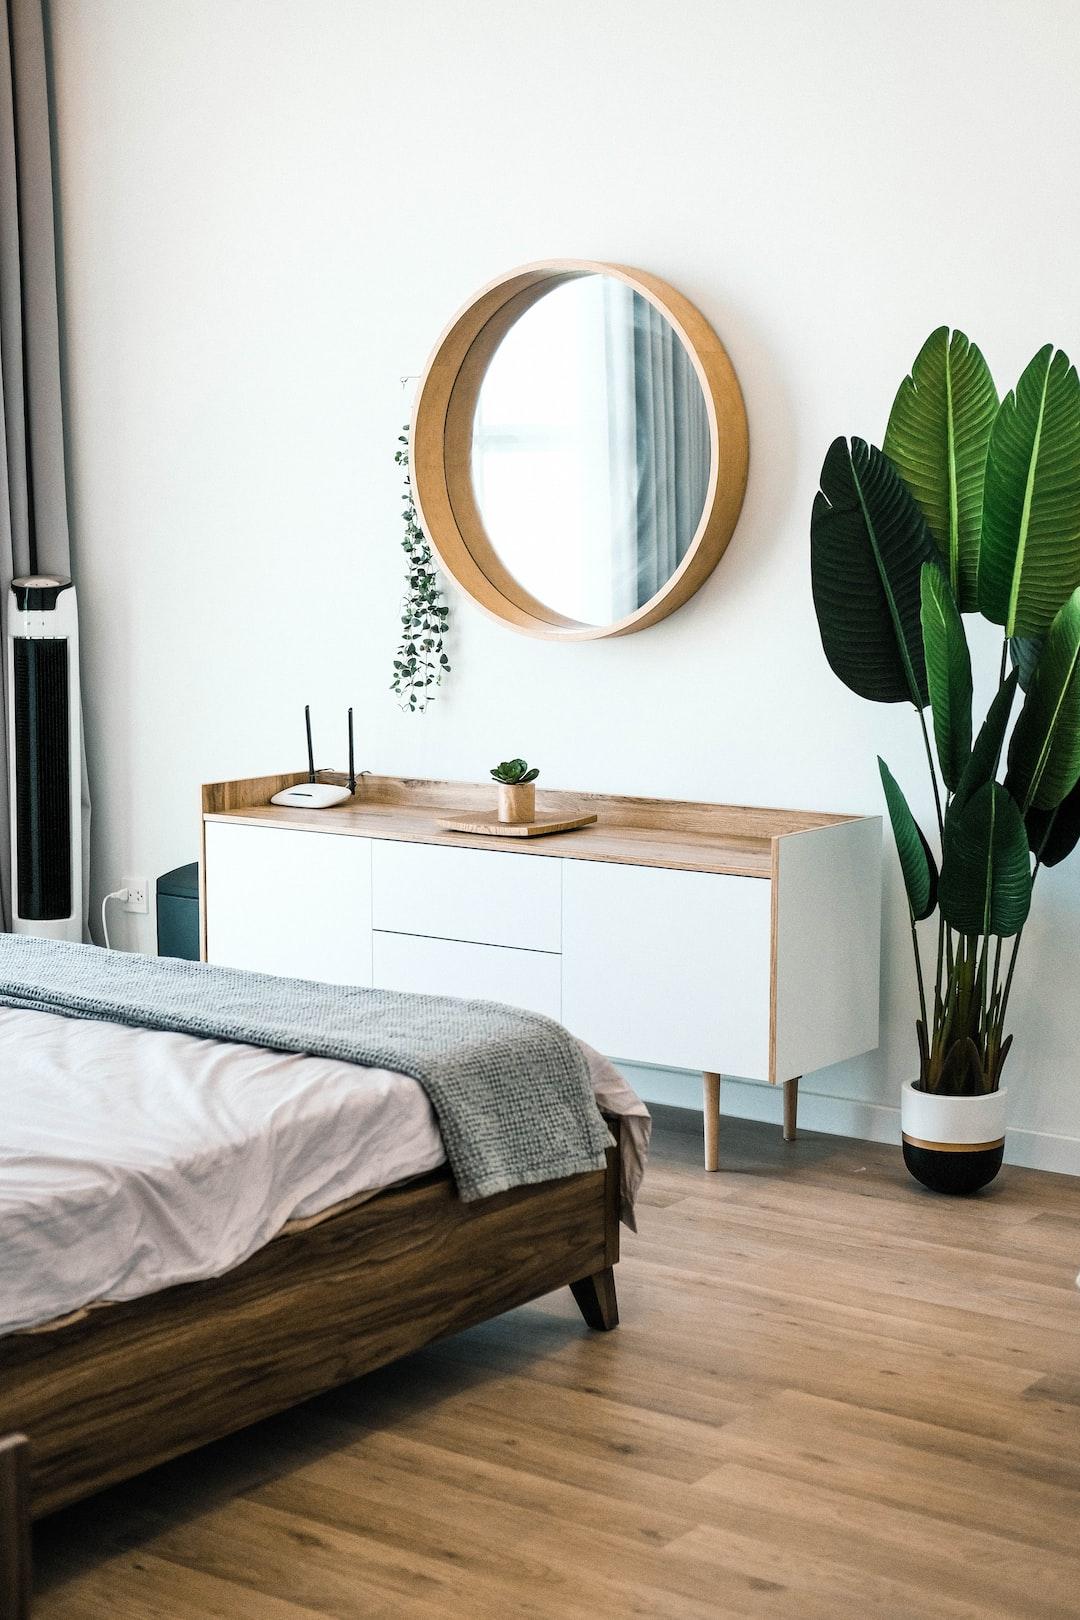 white wooden dresser with mirror photo – Free <b>Interior</b> Image on ...